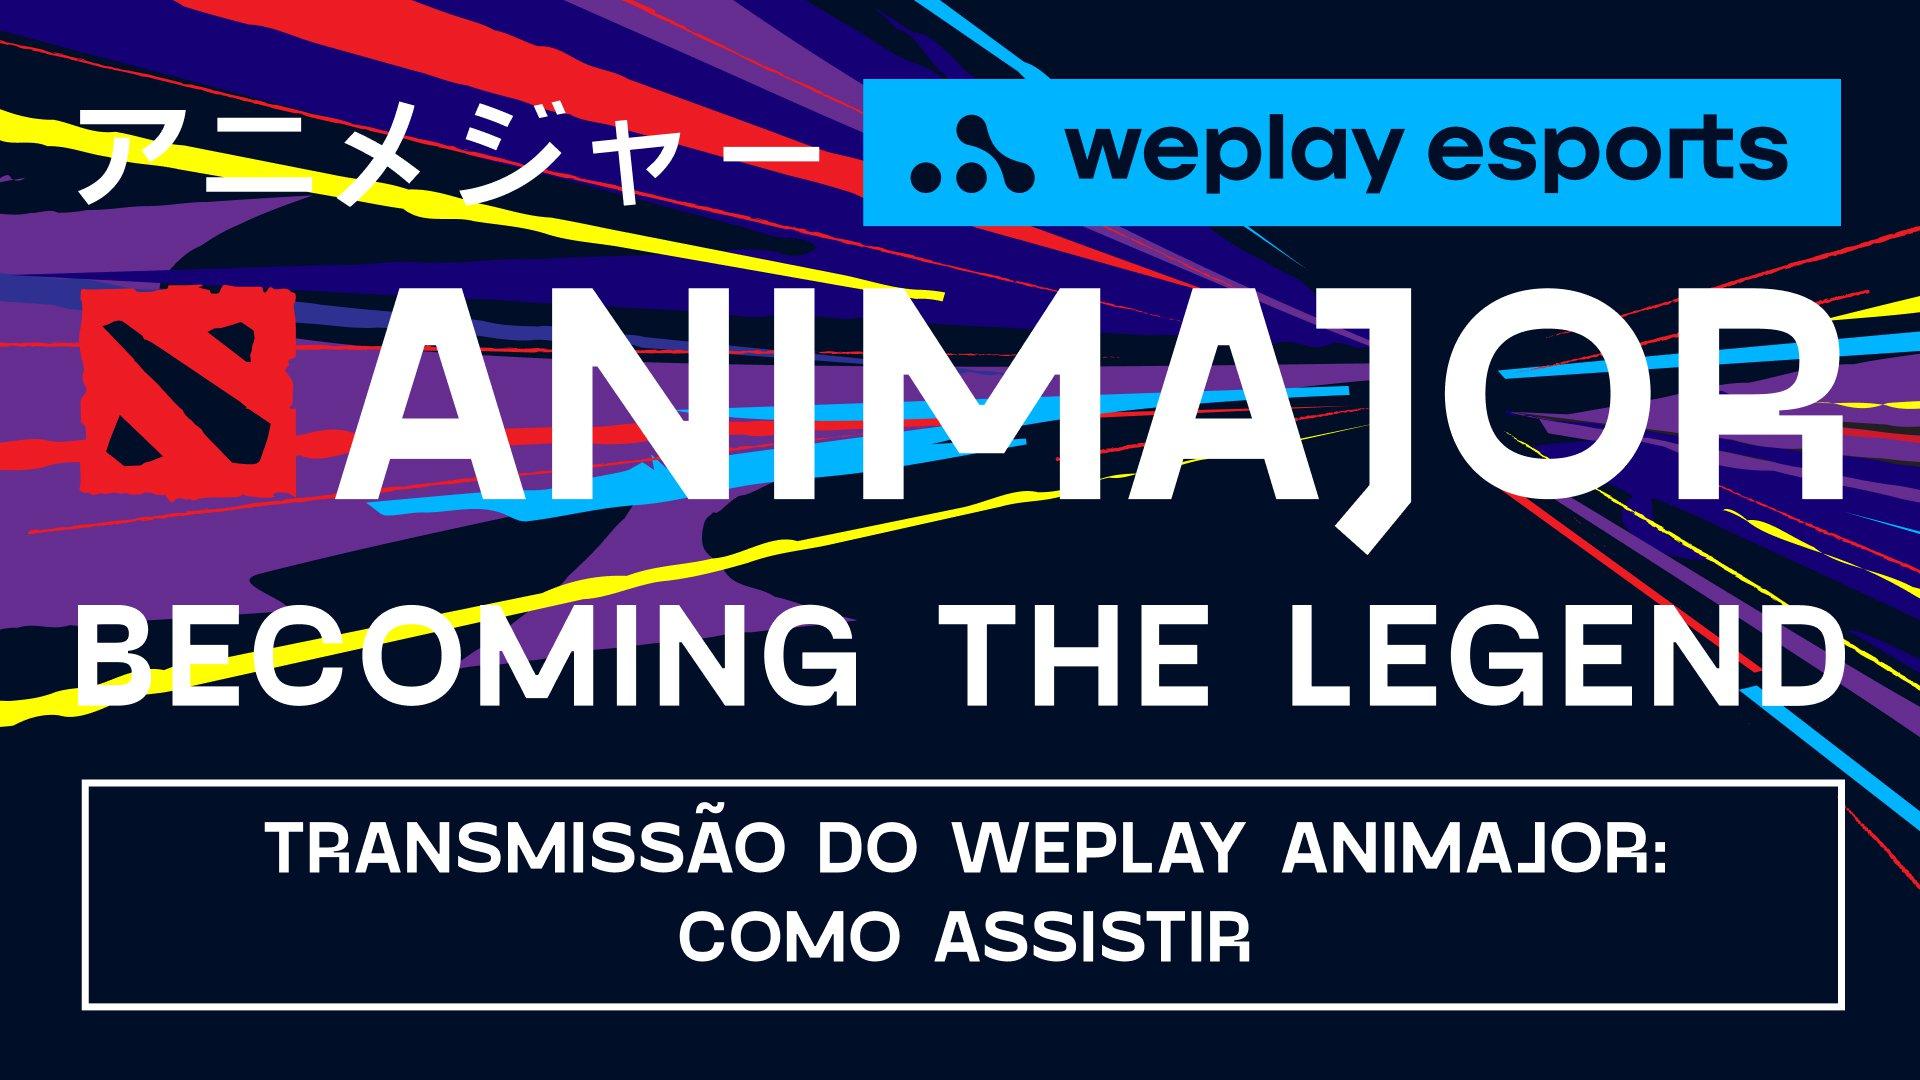 Transmissão do WePlay AniMajor. Imagem: WePlay Esports